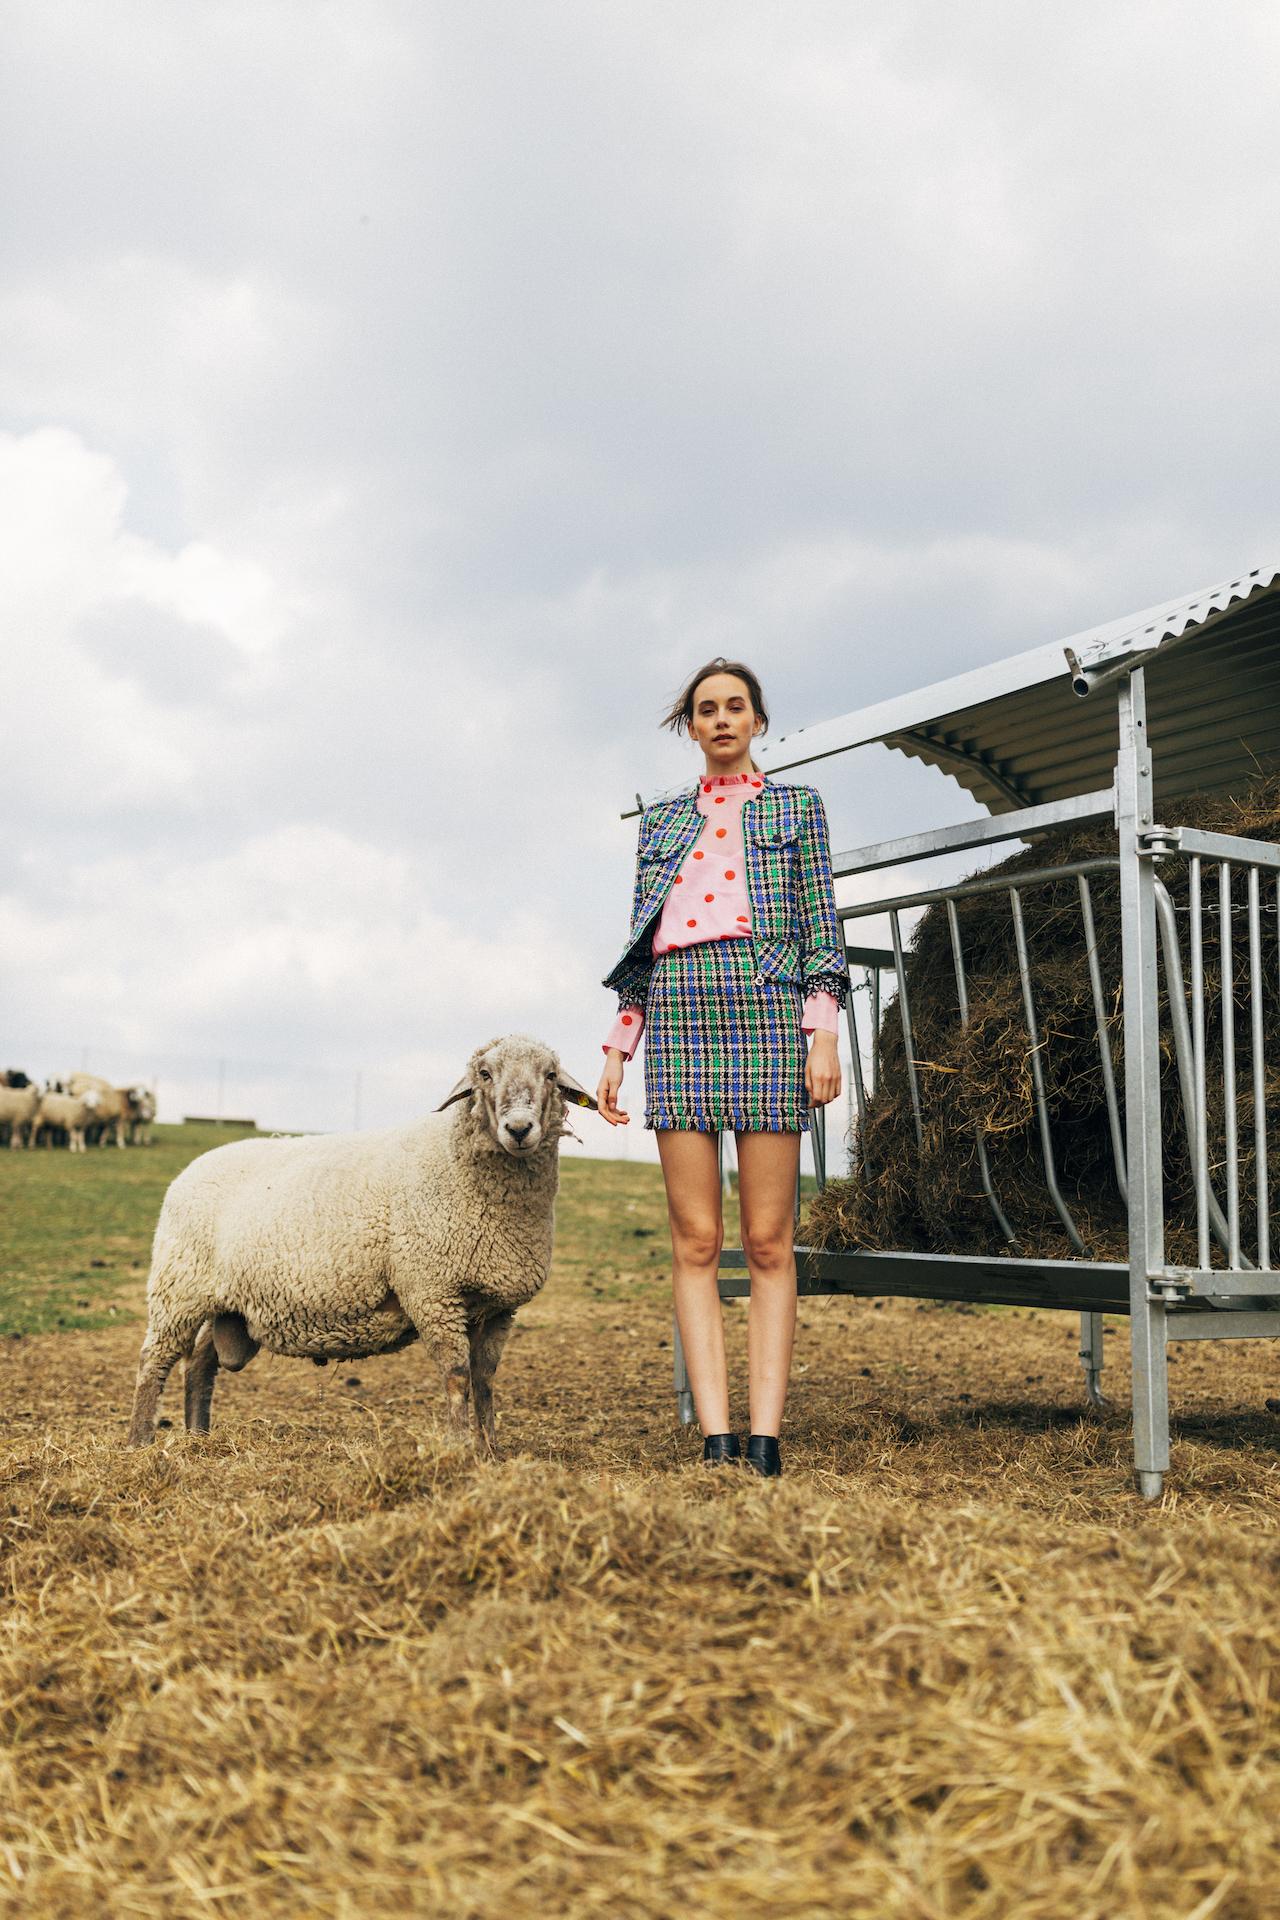 Stella Butz Bellezza Modelling Sheep